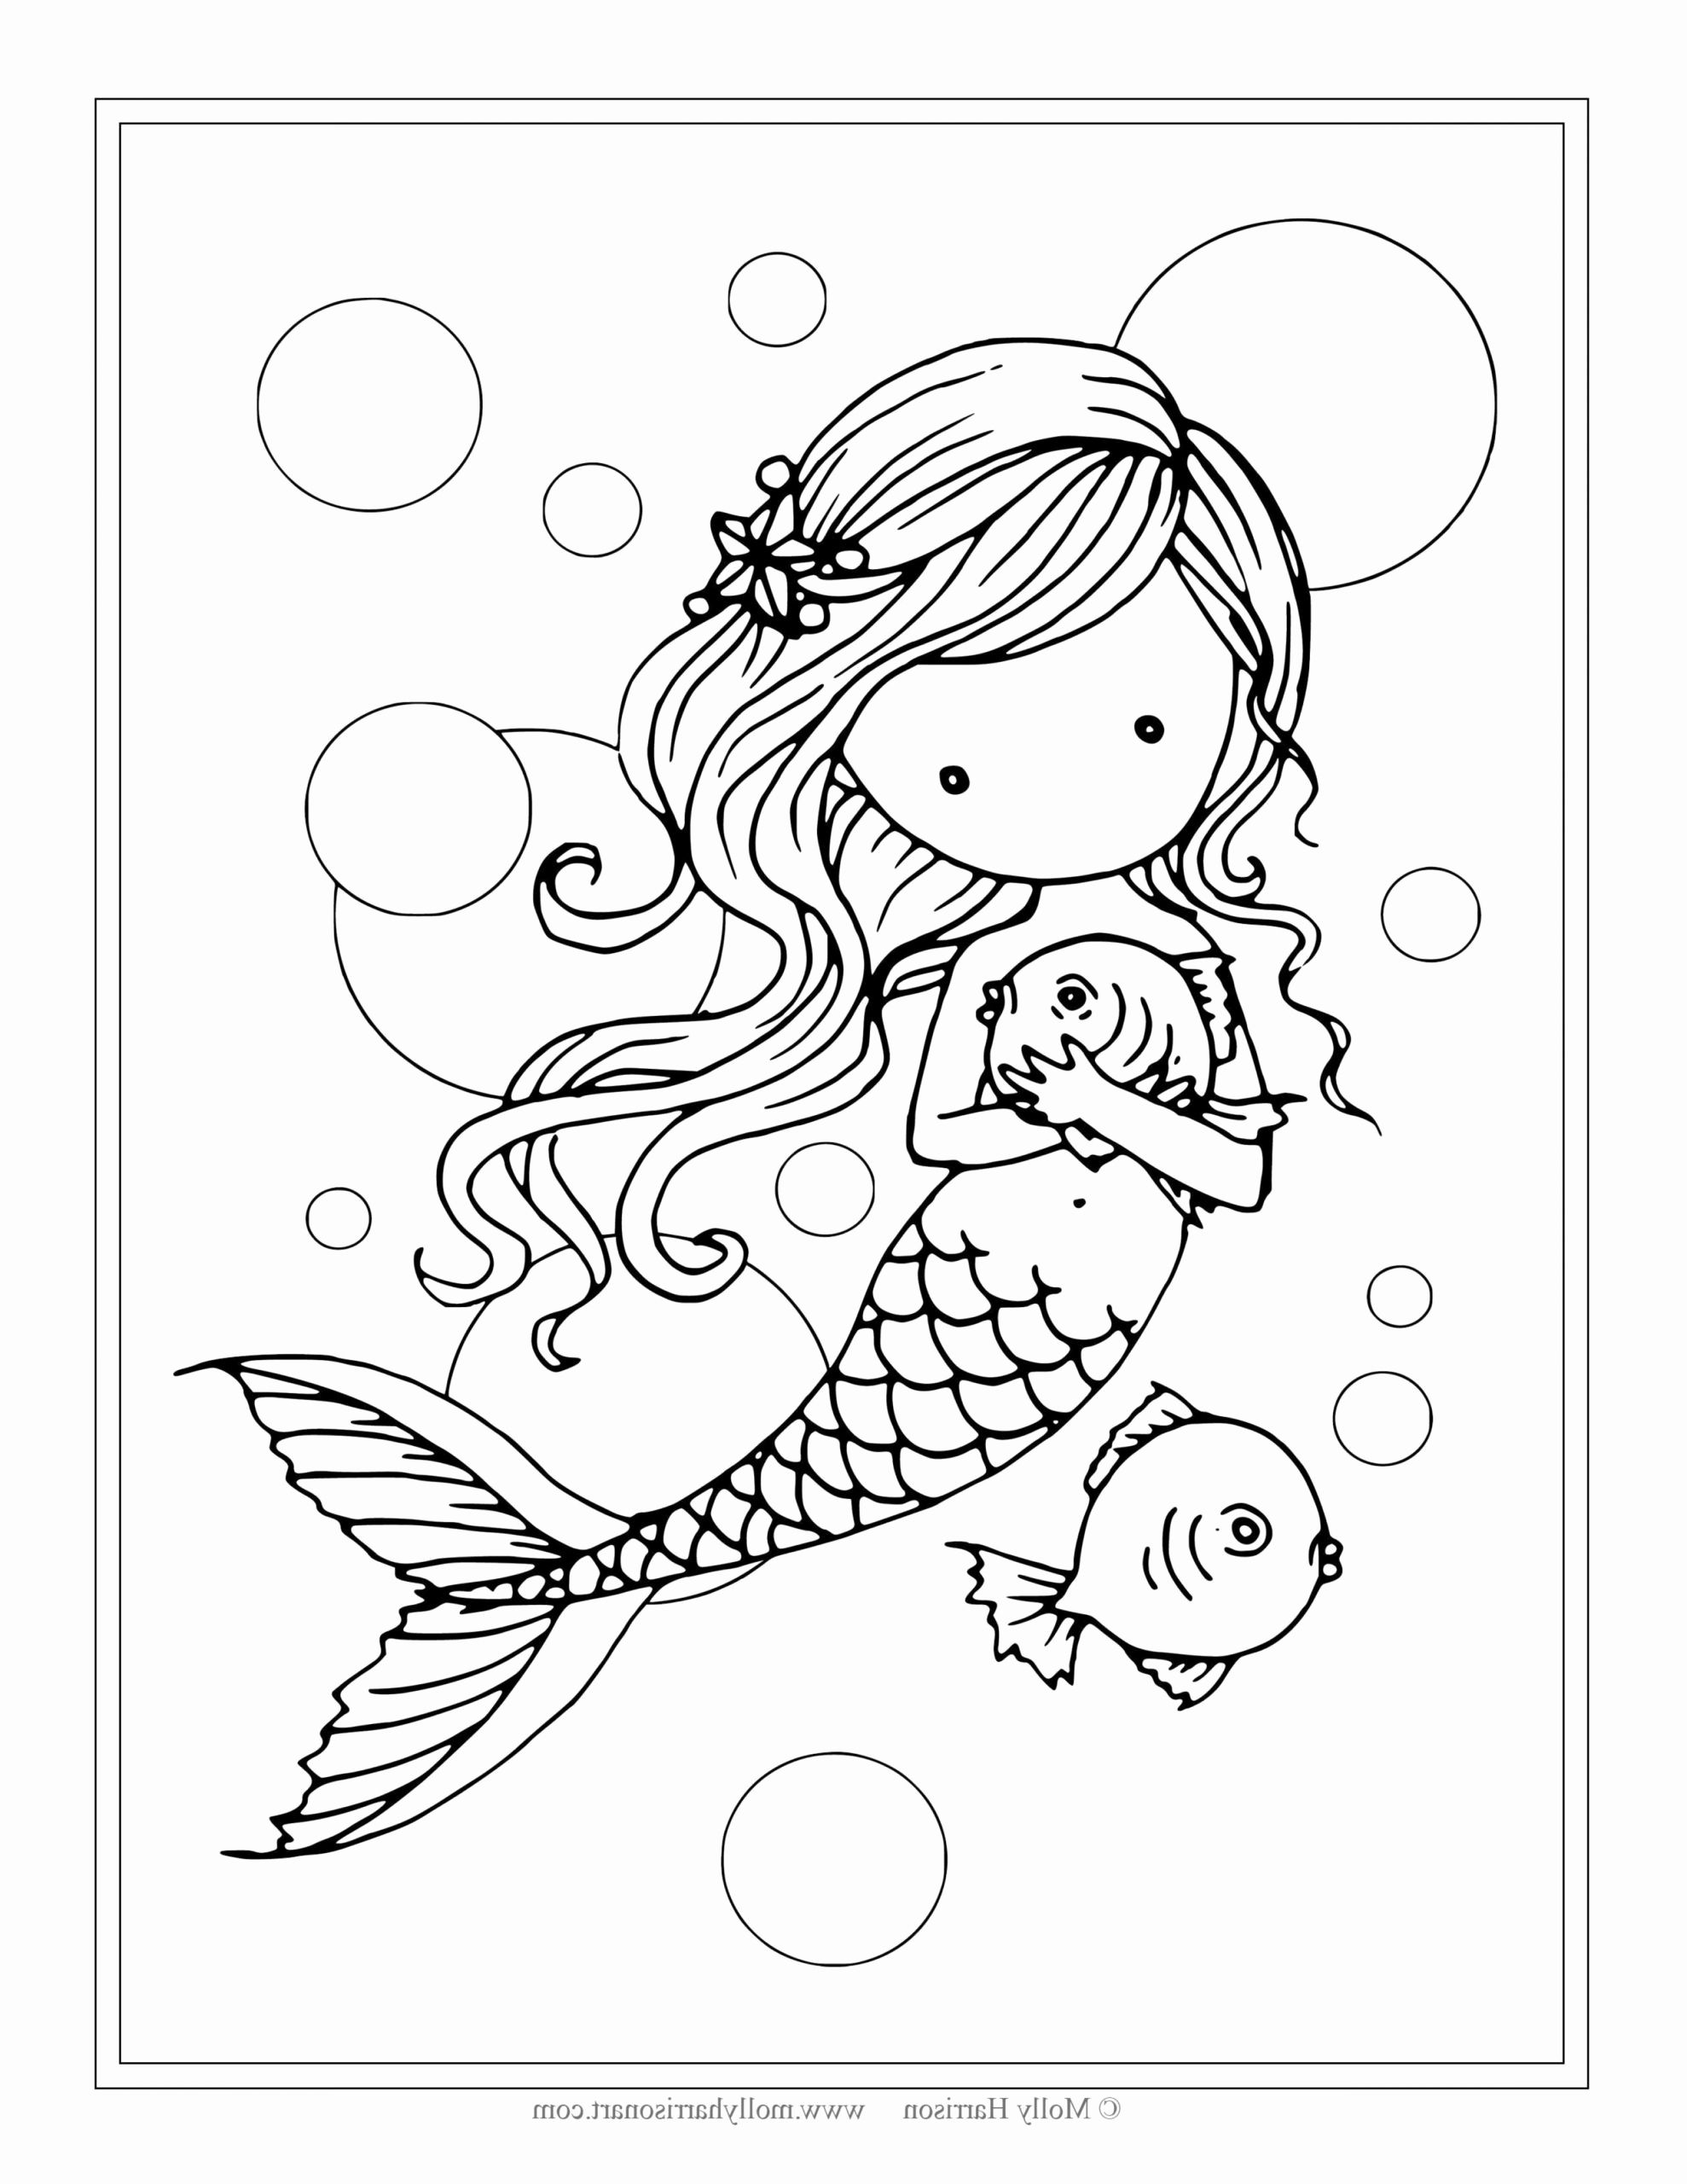 Kids Mermaid Coloring Pages Clip Art Mermaid Coloring Pages Mermaid Coloring Book Mandala Coloring Pages